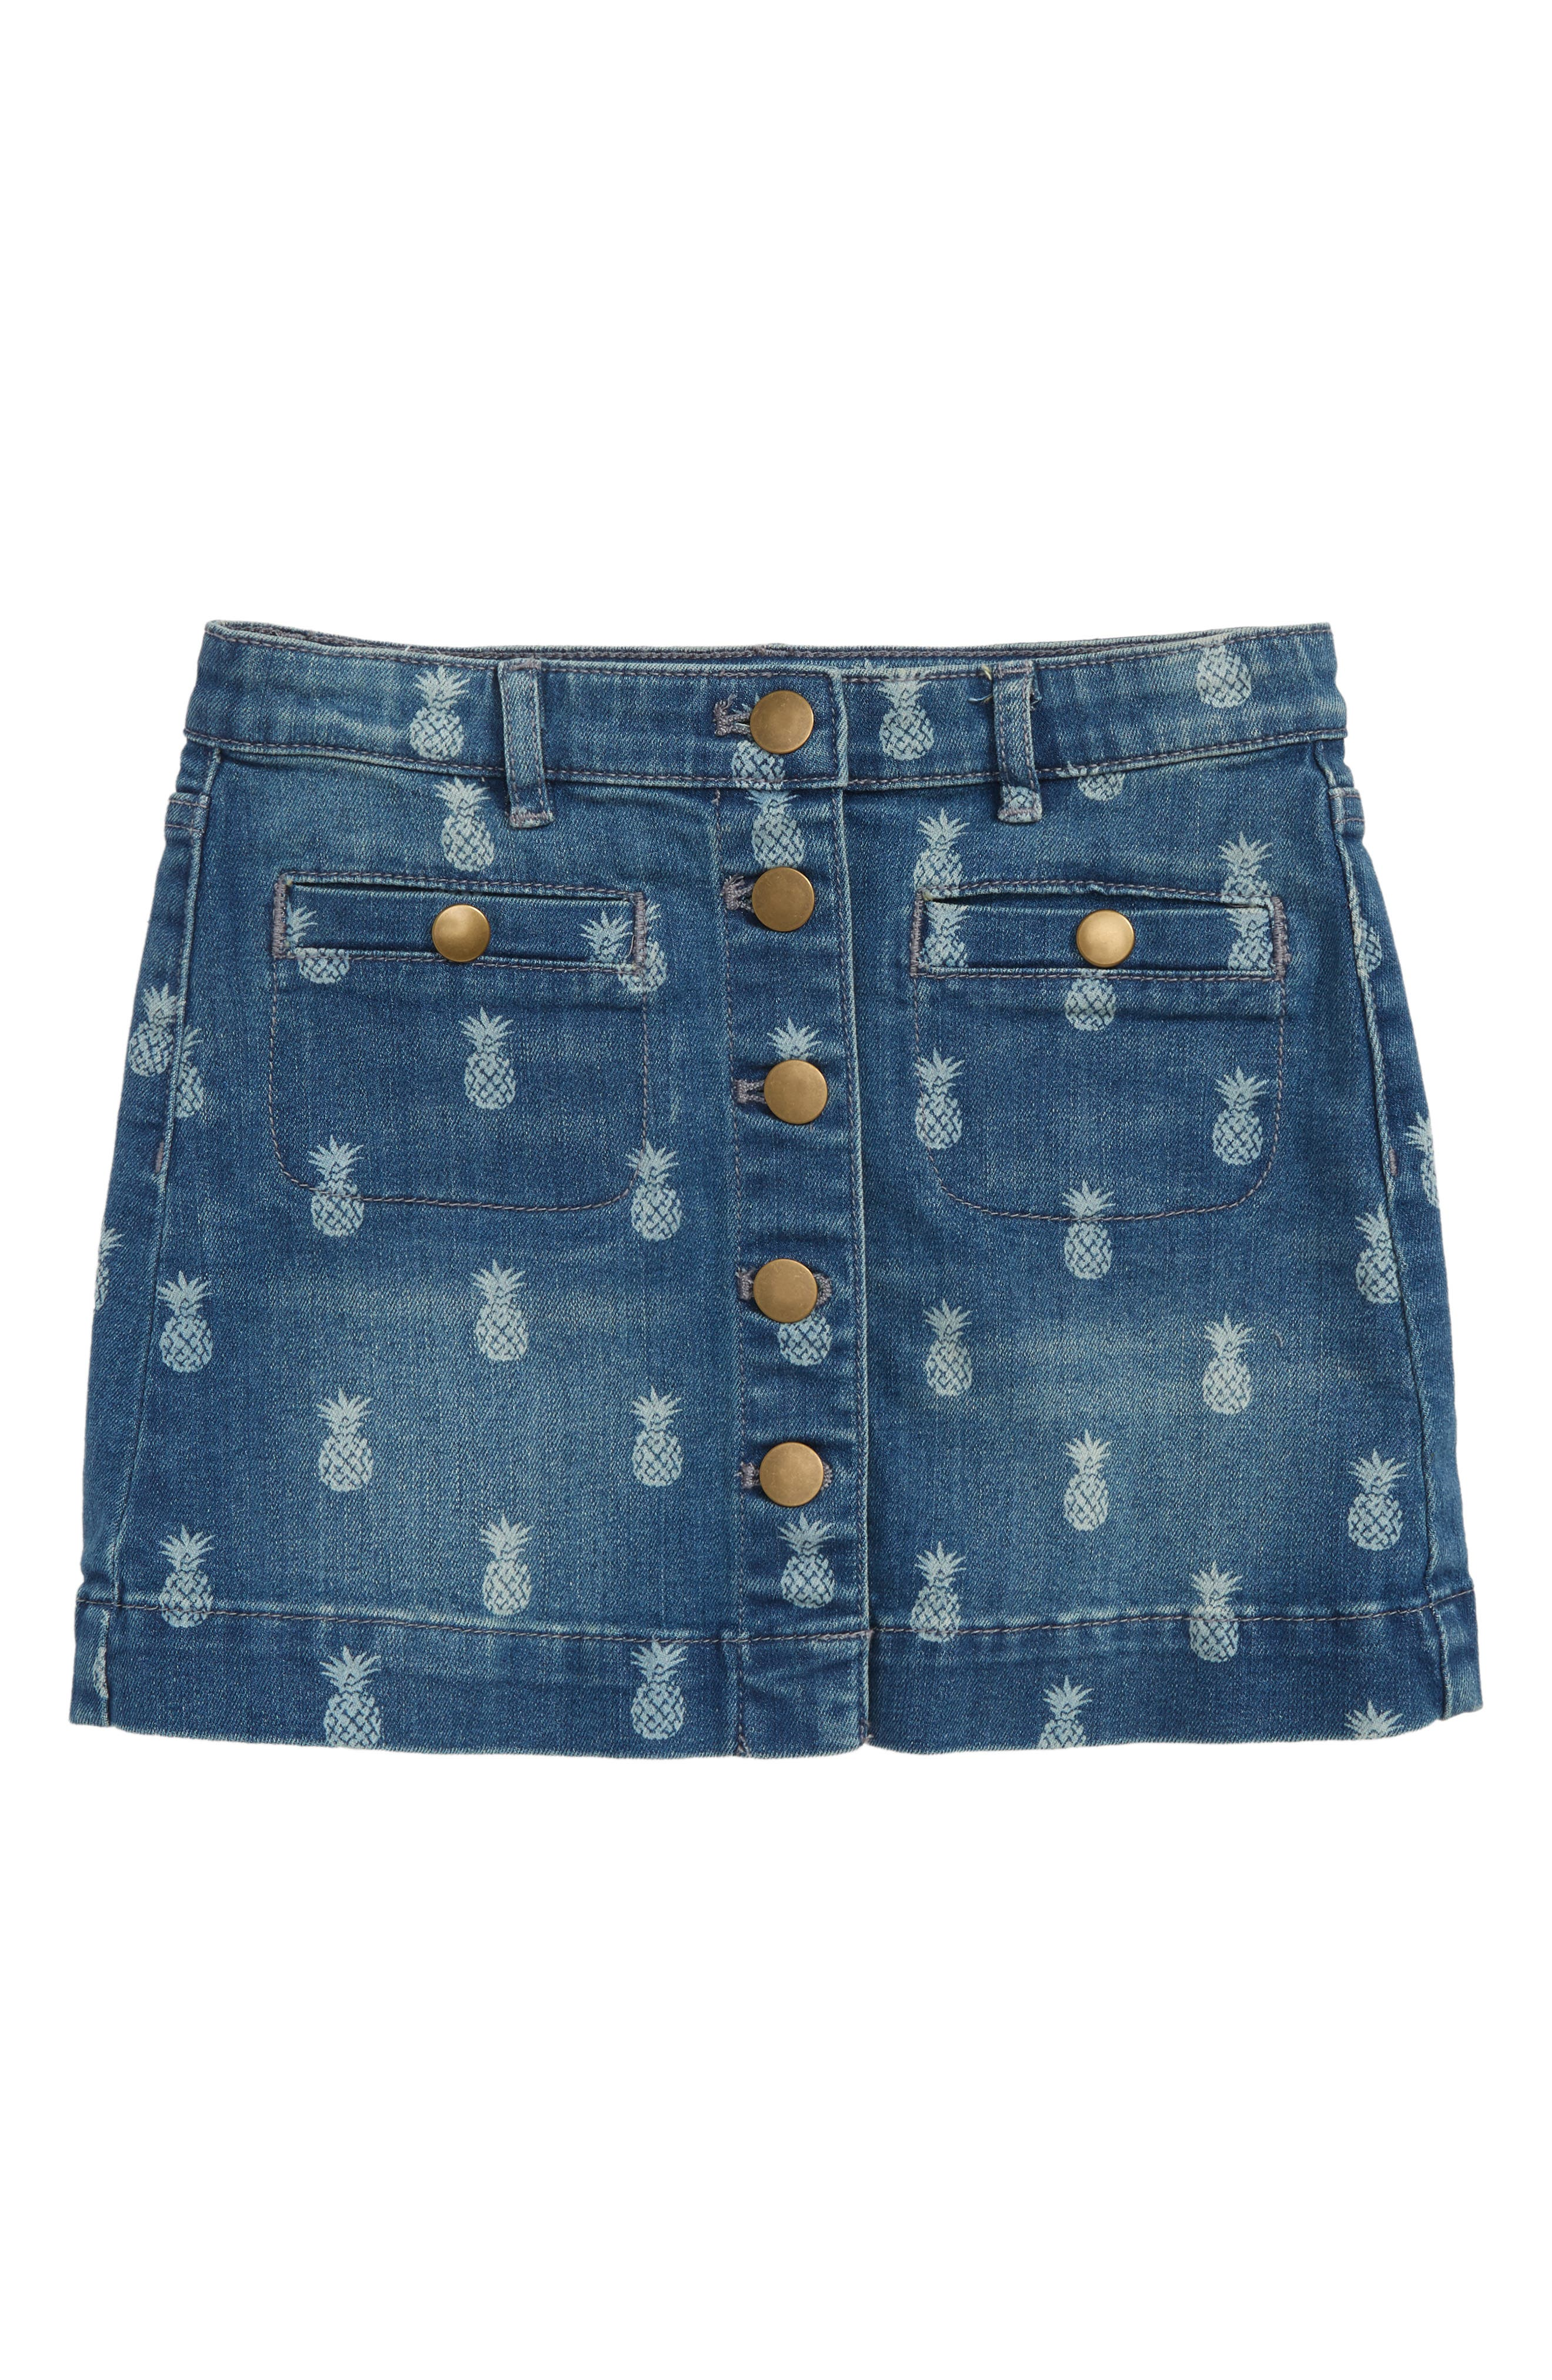 Pineapple Print Denim Skirt,                             Main thumbnail 1, color,                             Indigo Ivory